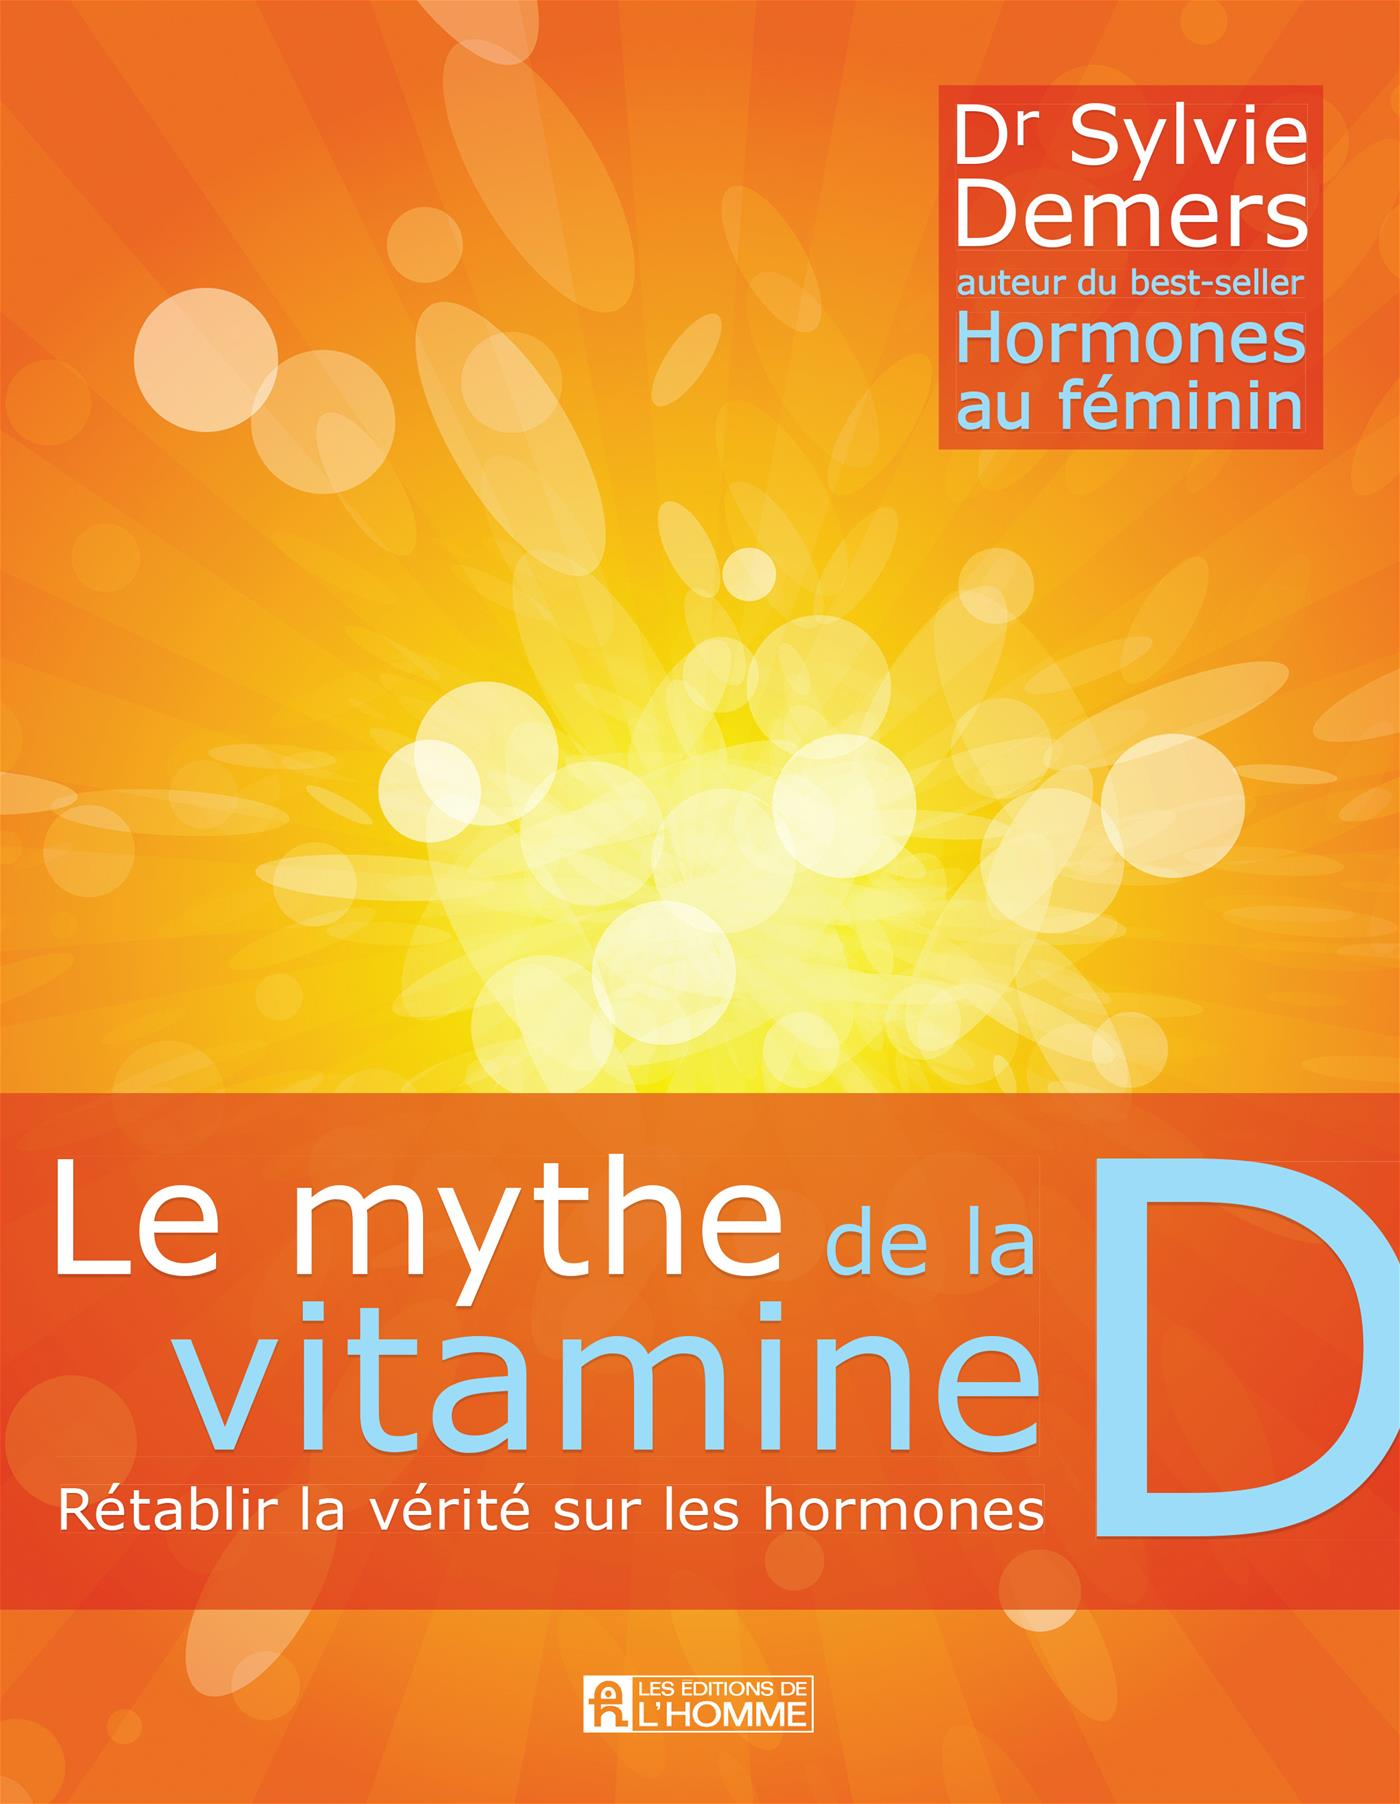 Le mythe de la vitamine D